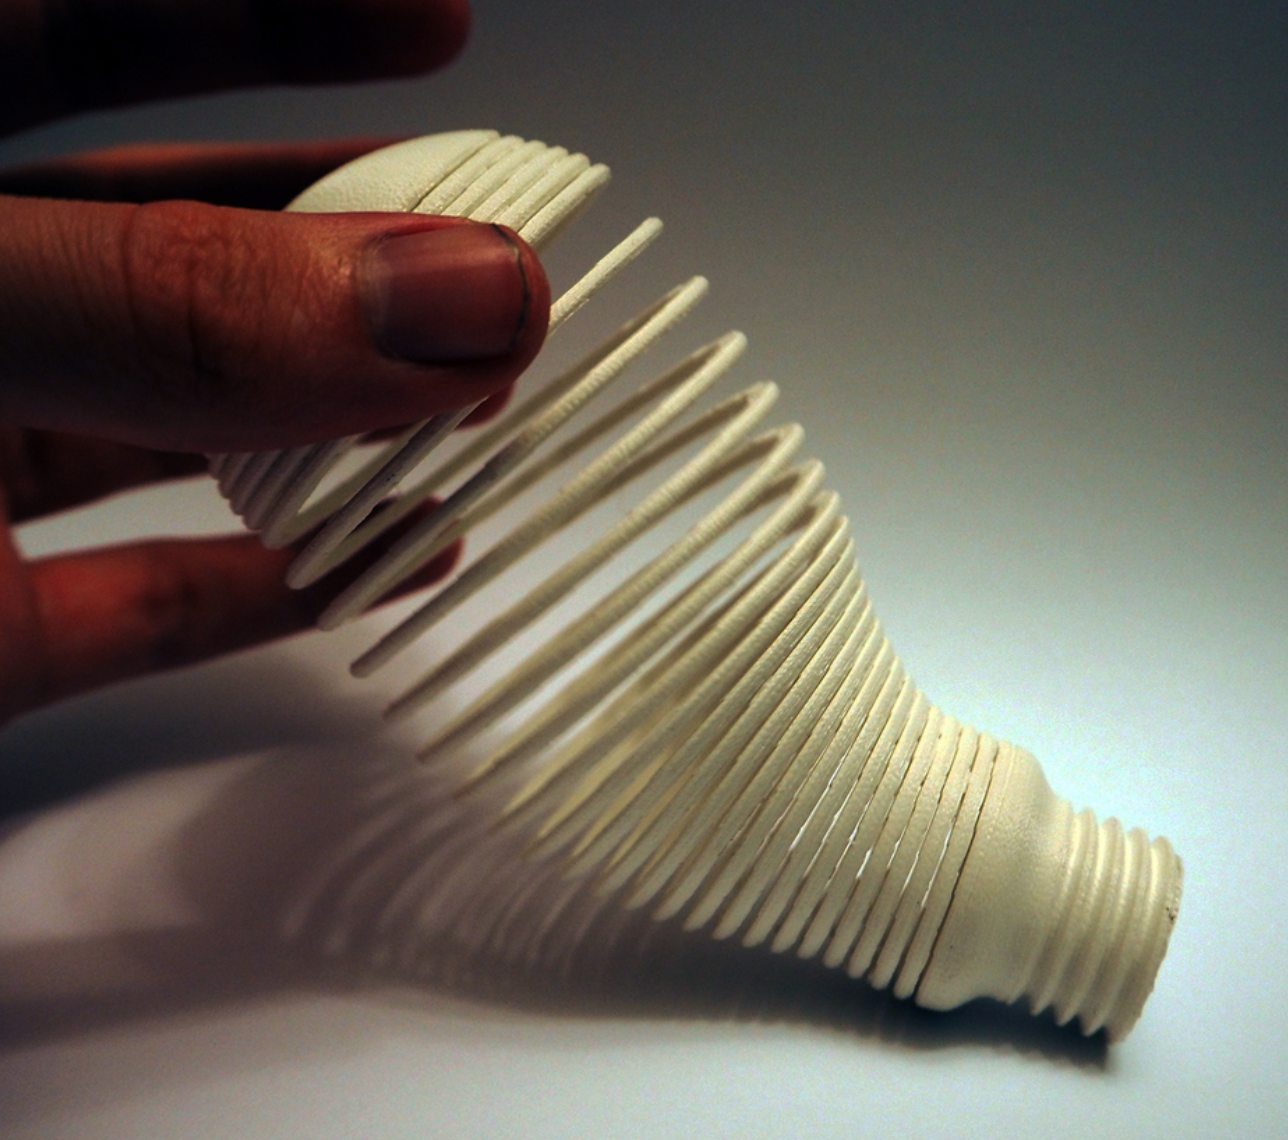 Capture d'écran 2017-11-06 à 09.25.13.png Download free STL file Light Bulb Sculpture 2 (Springo) • 3D printing object, Toomblercazz